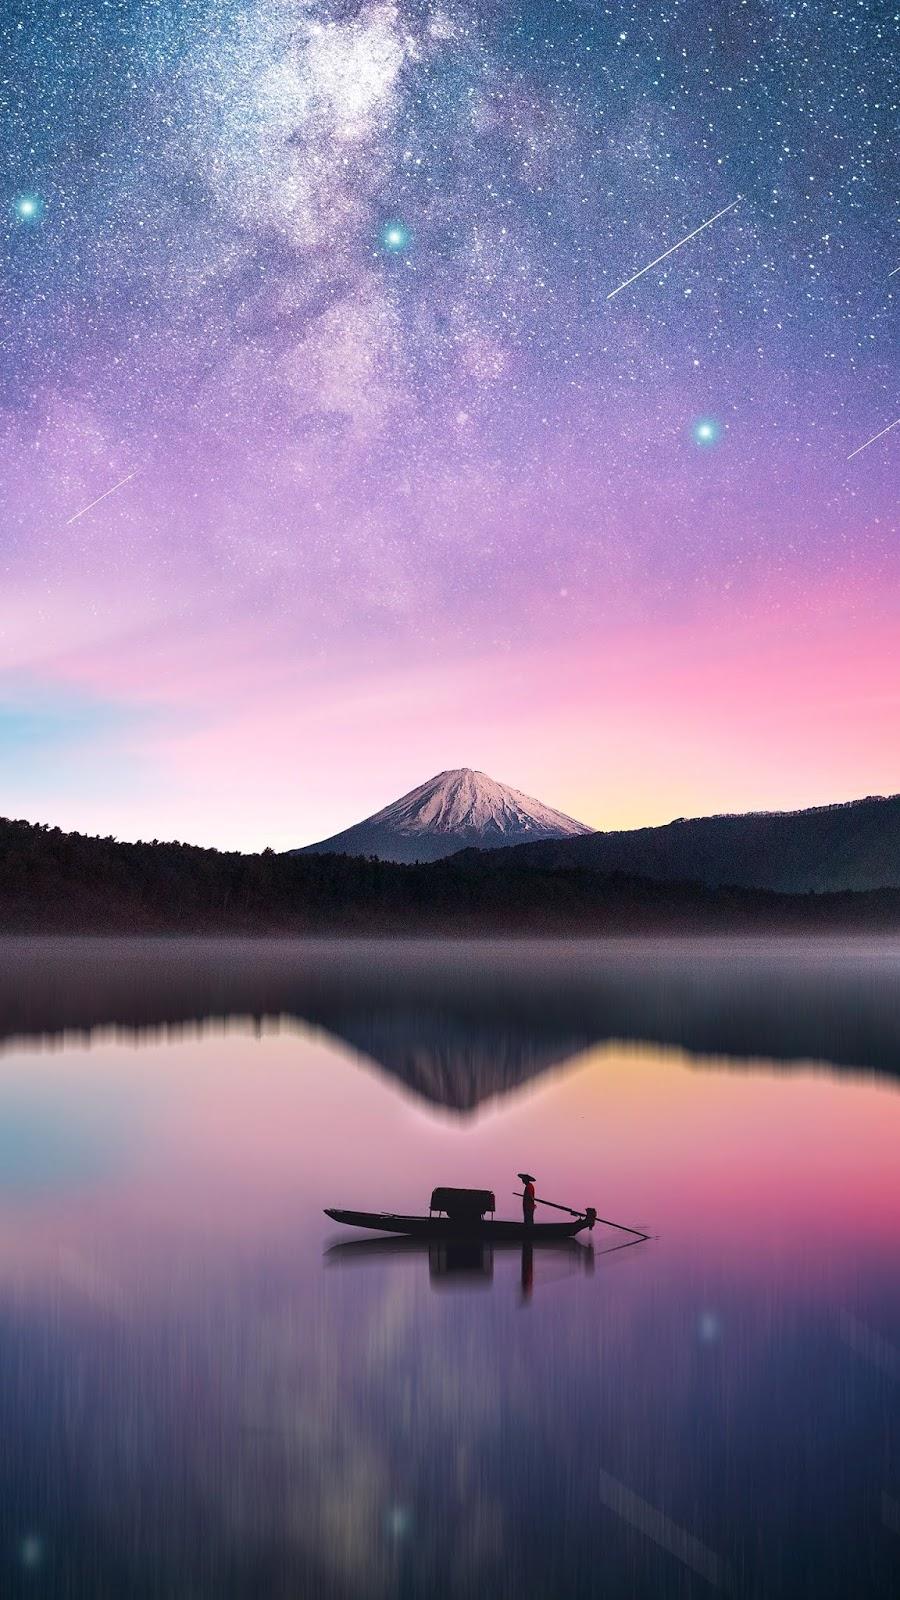 Milky way in mount Fuji wallpaper